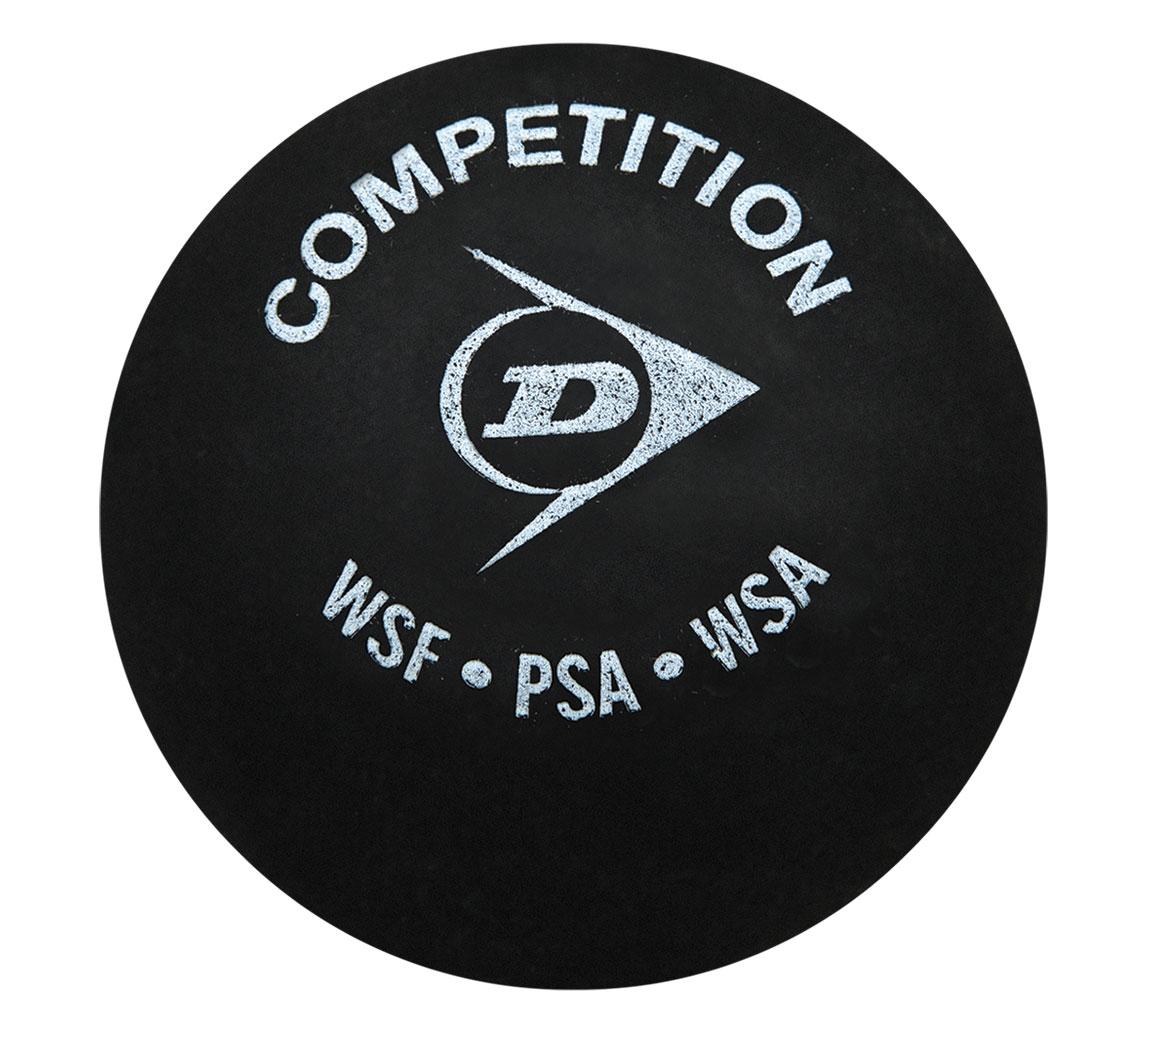 https://www.best4balls.com/pub/media/catalog/product/s/q/squash_competition2.jpg